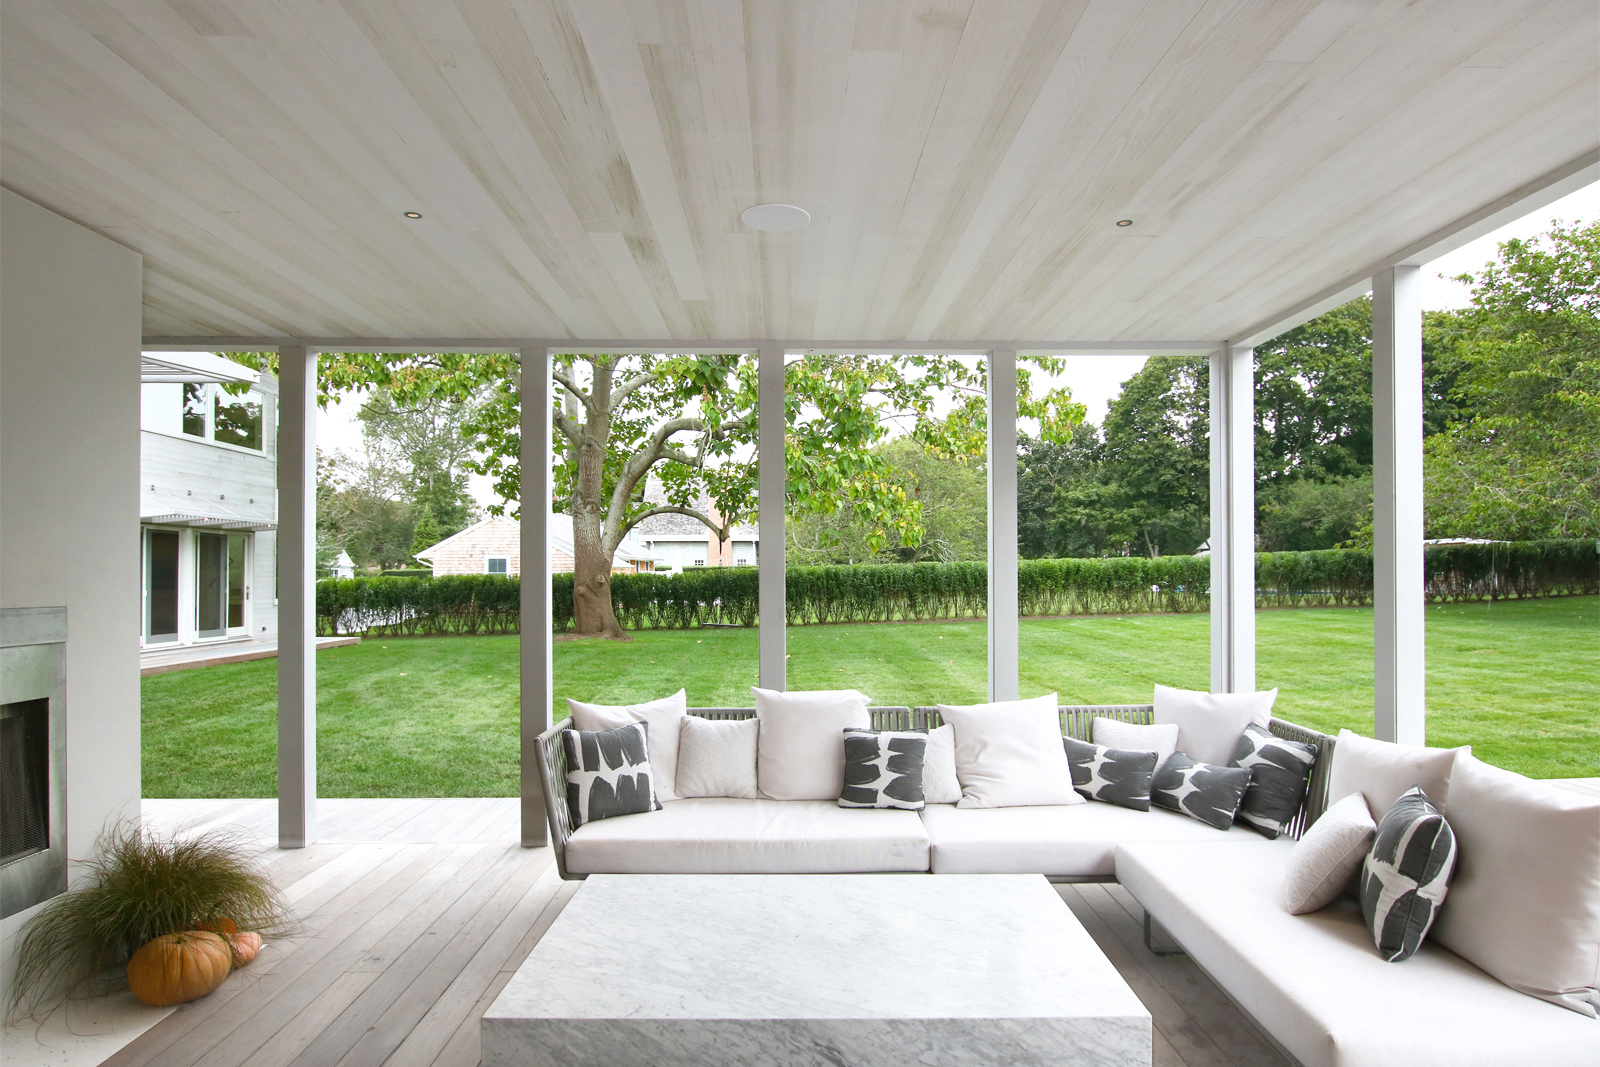 24-re4a-resolution-4-architecture-modern-modular-prefab-bridgehampton house-exterior-screened-porch.jpg